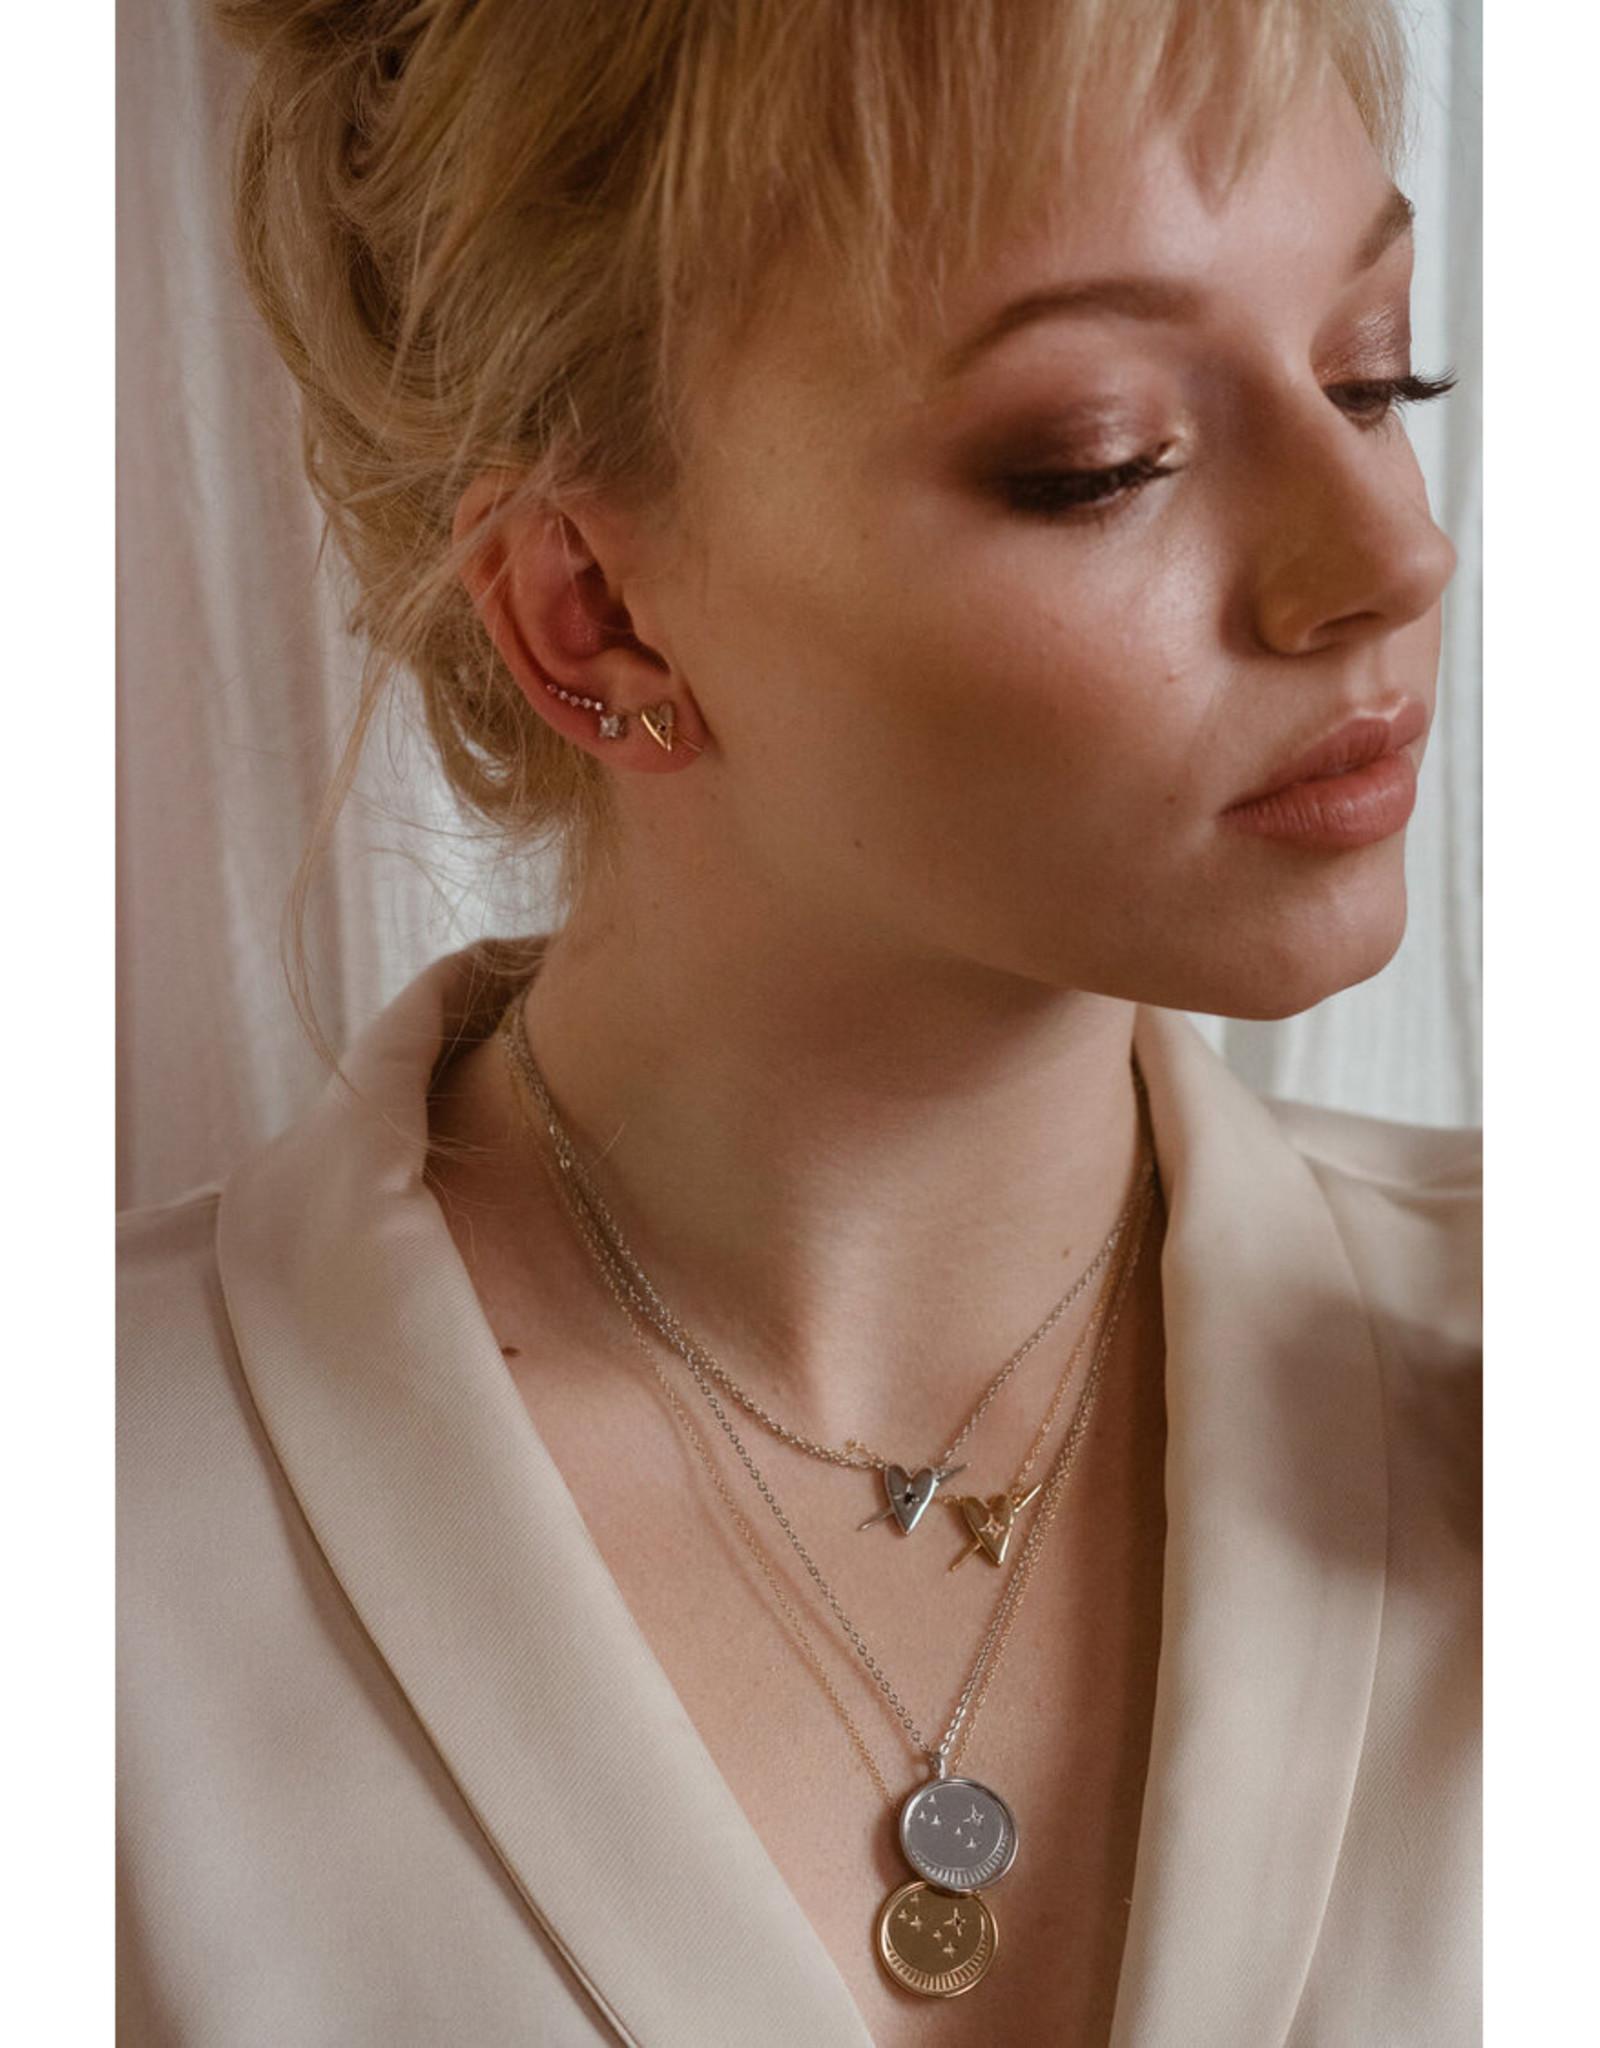 Sarah Mulder Jewelry Gold Lady Ear Climbers - Rose Quartz